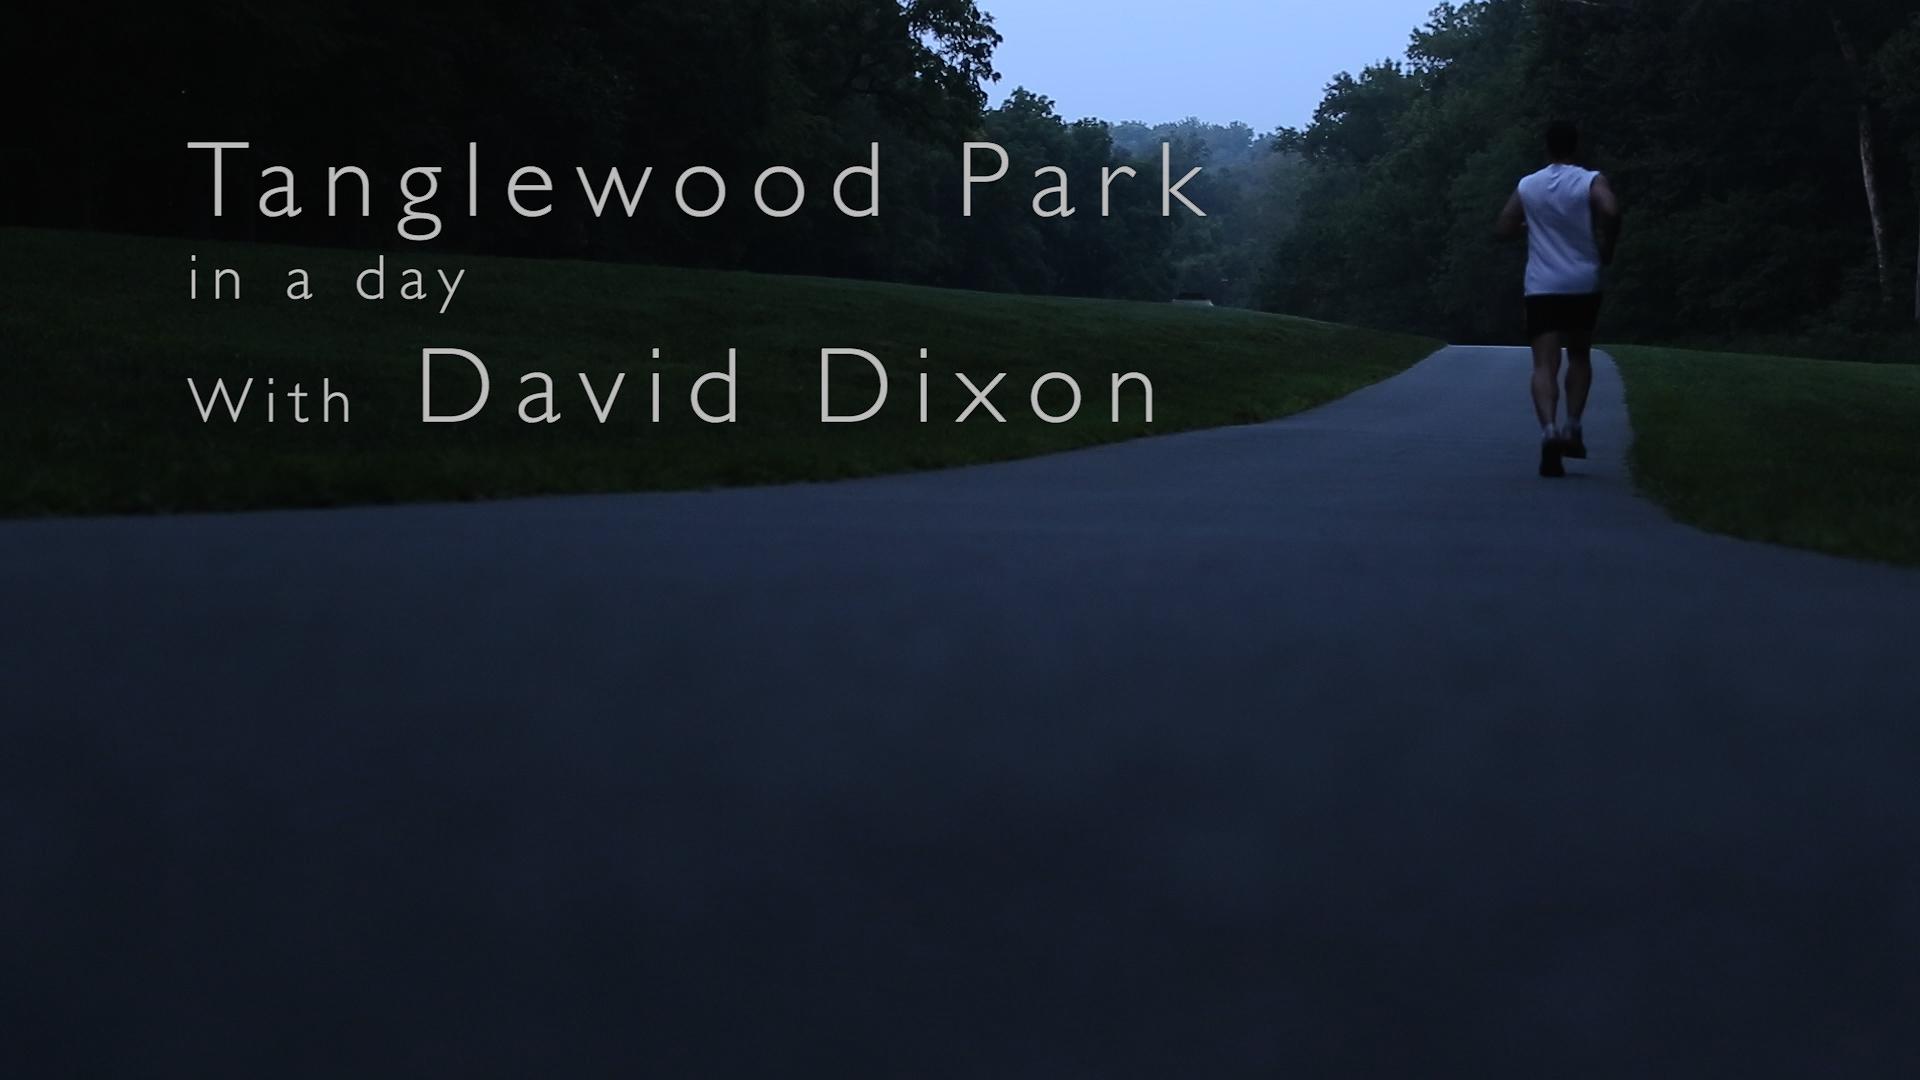 """Tanglewood Park"" Winston, NC"